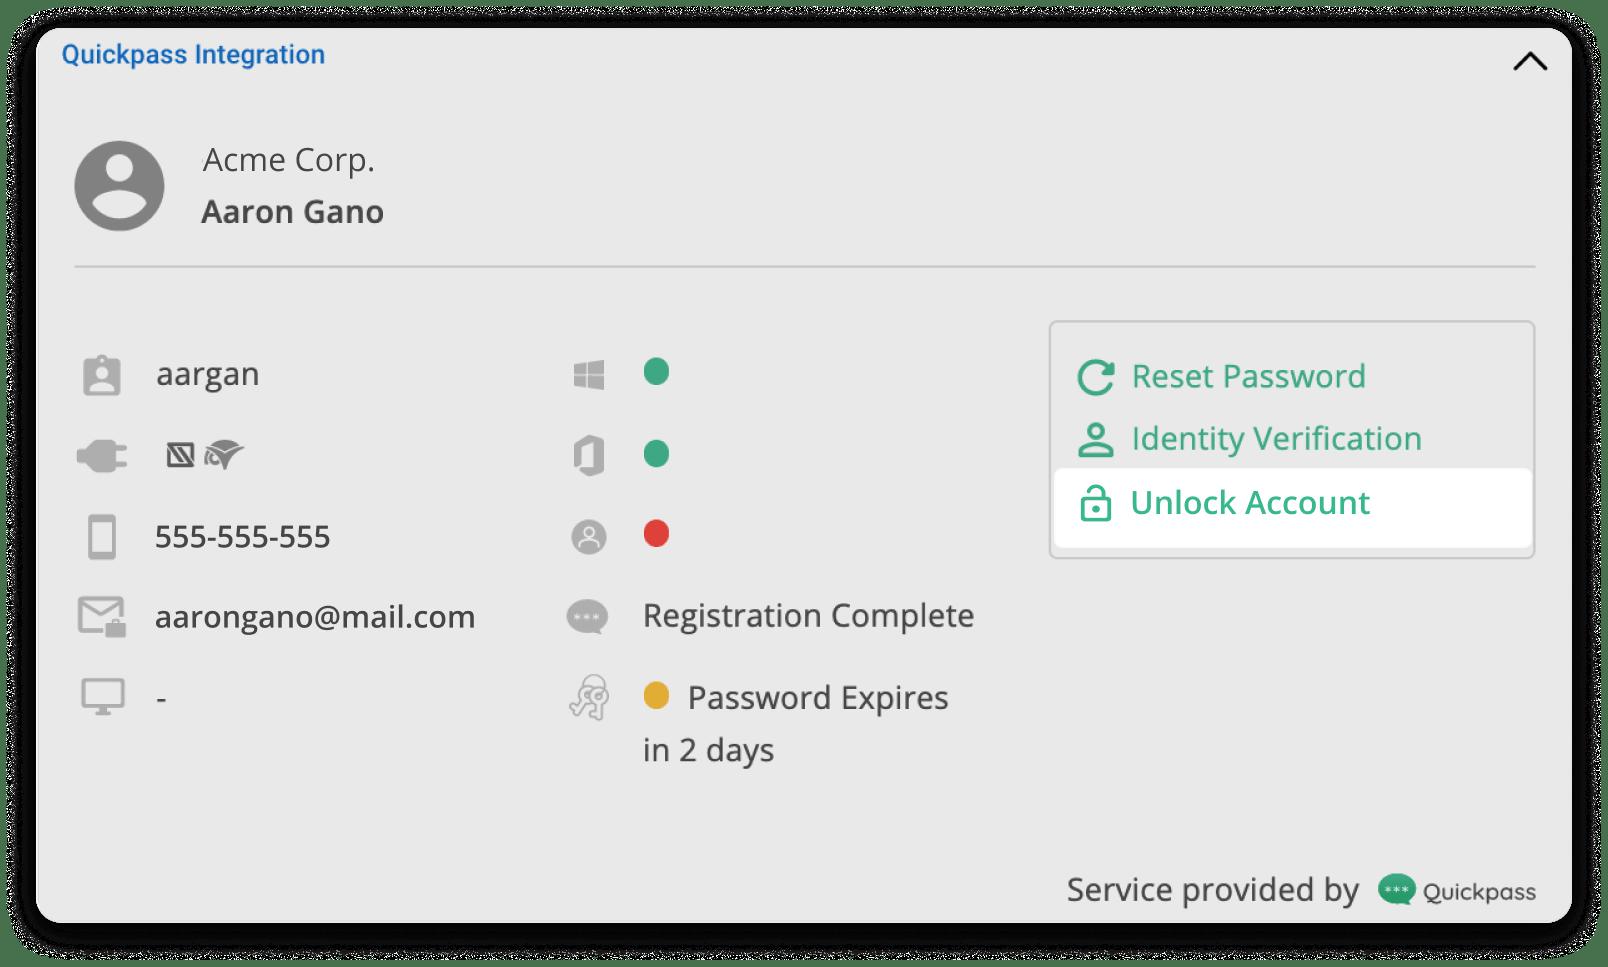 Unlock account Option Highlighted on Quickpass pod